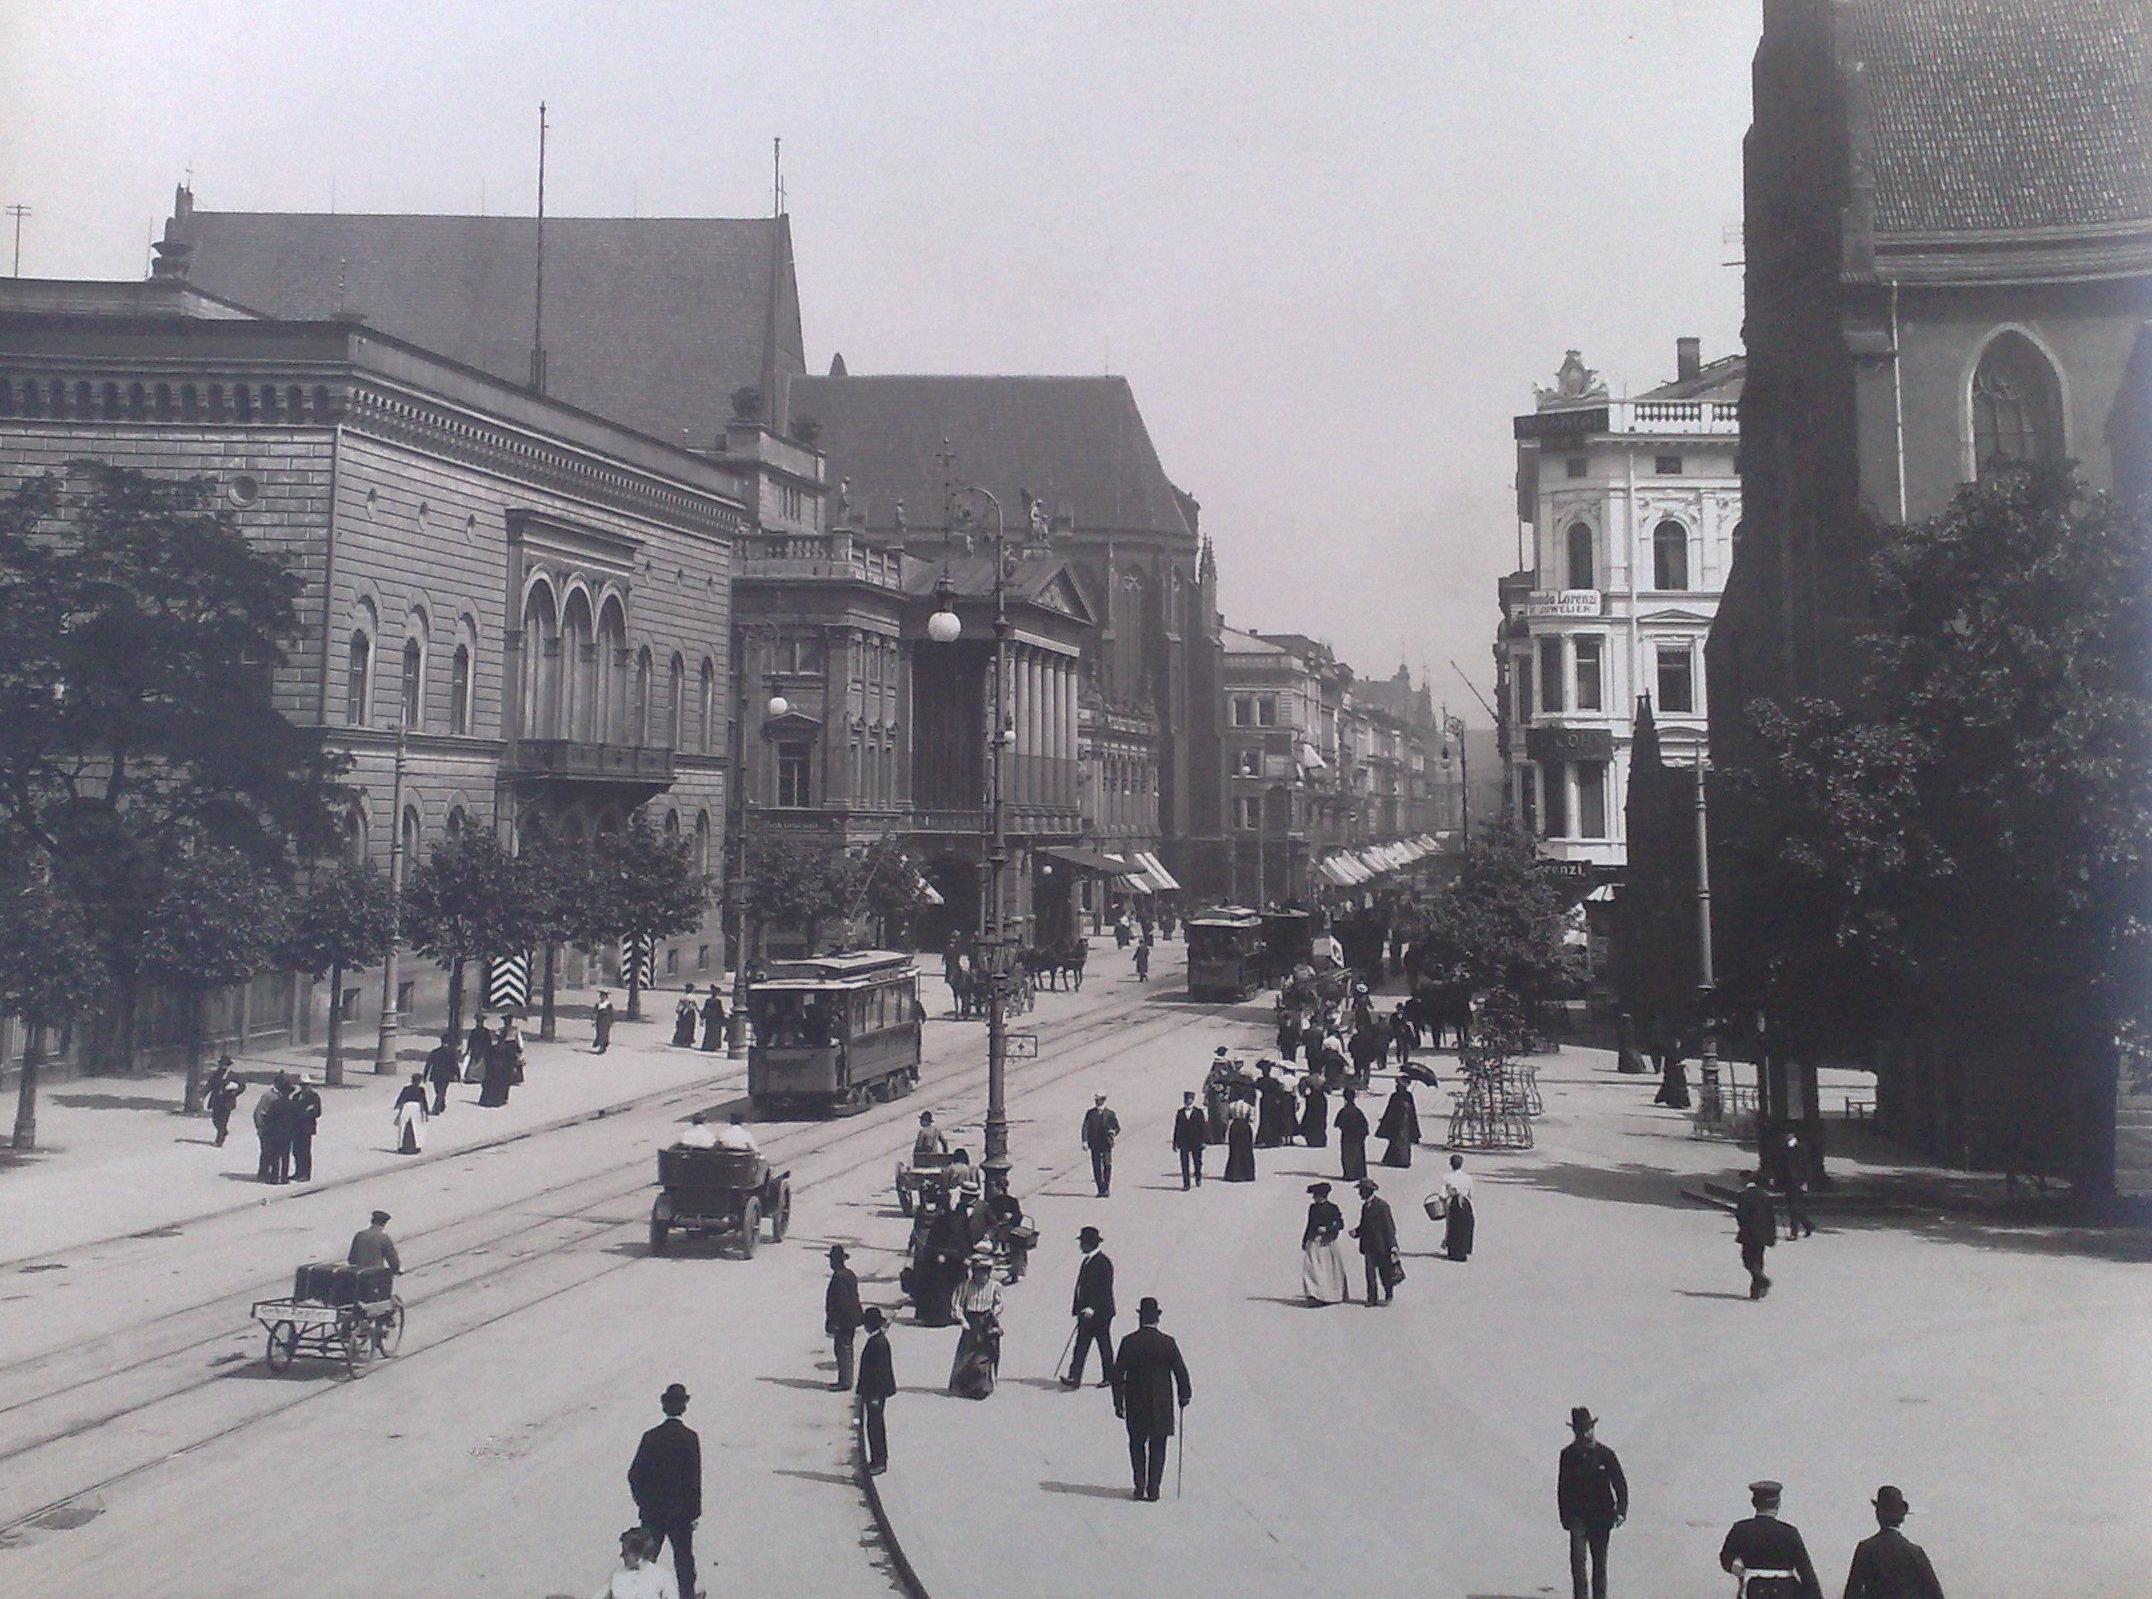 https://upload.wikimedia.org/wikipedia/commons/3/34/Breslau_Schweidnizer_Strasse_1906.jpg